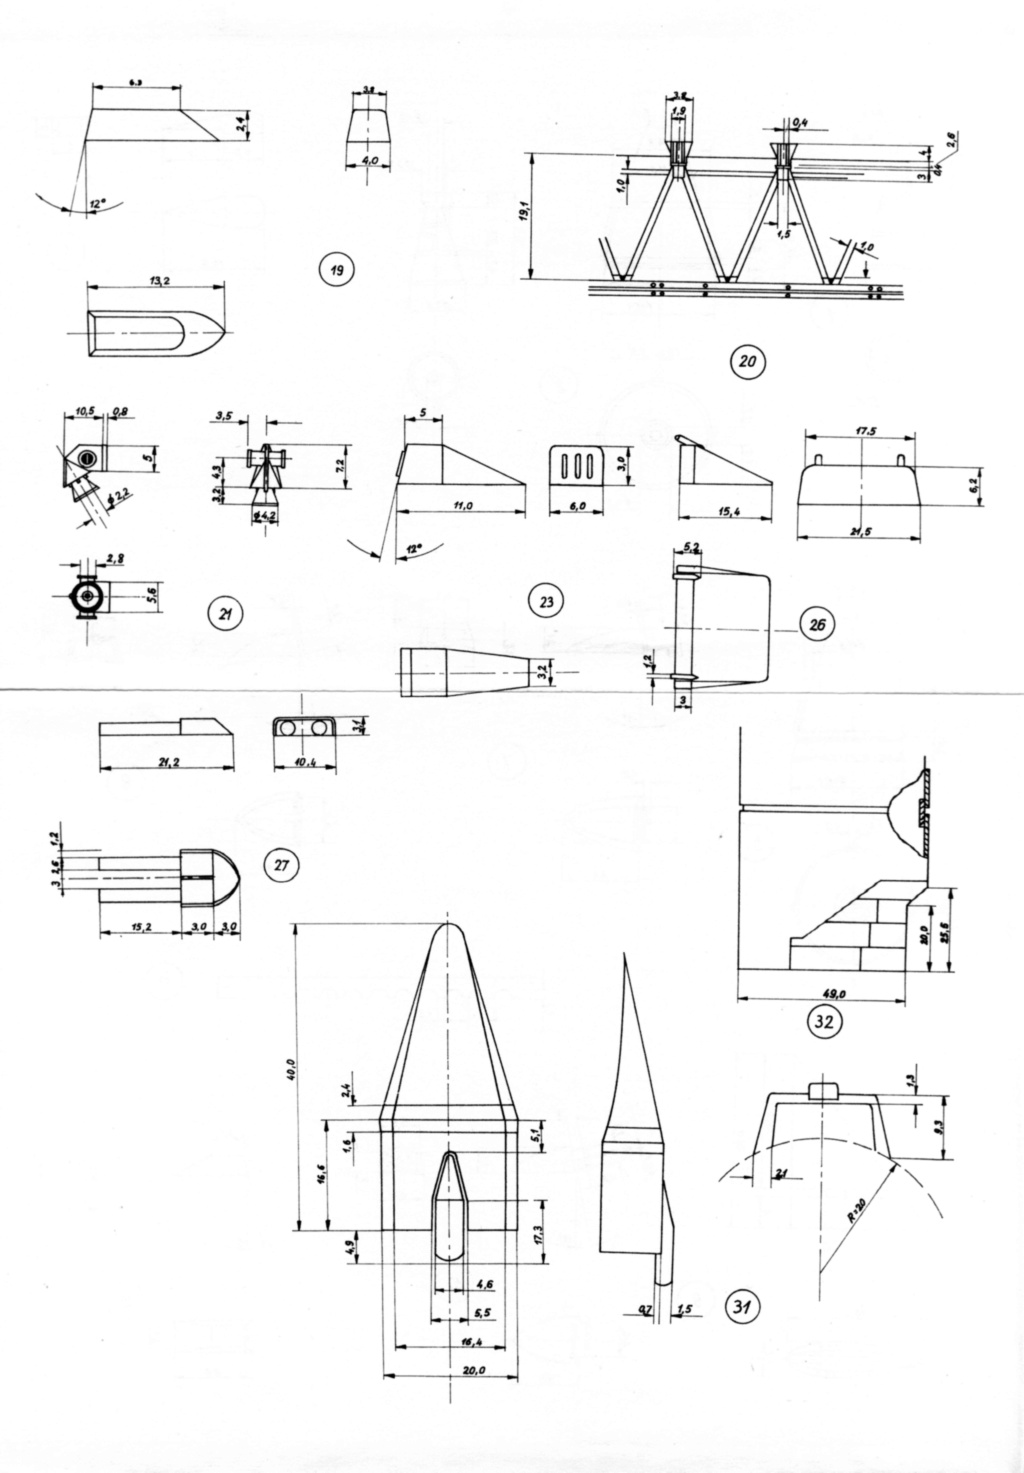 Vostok R7 Vostok10